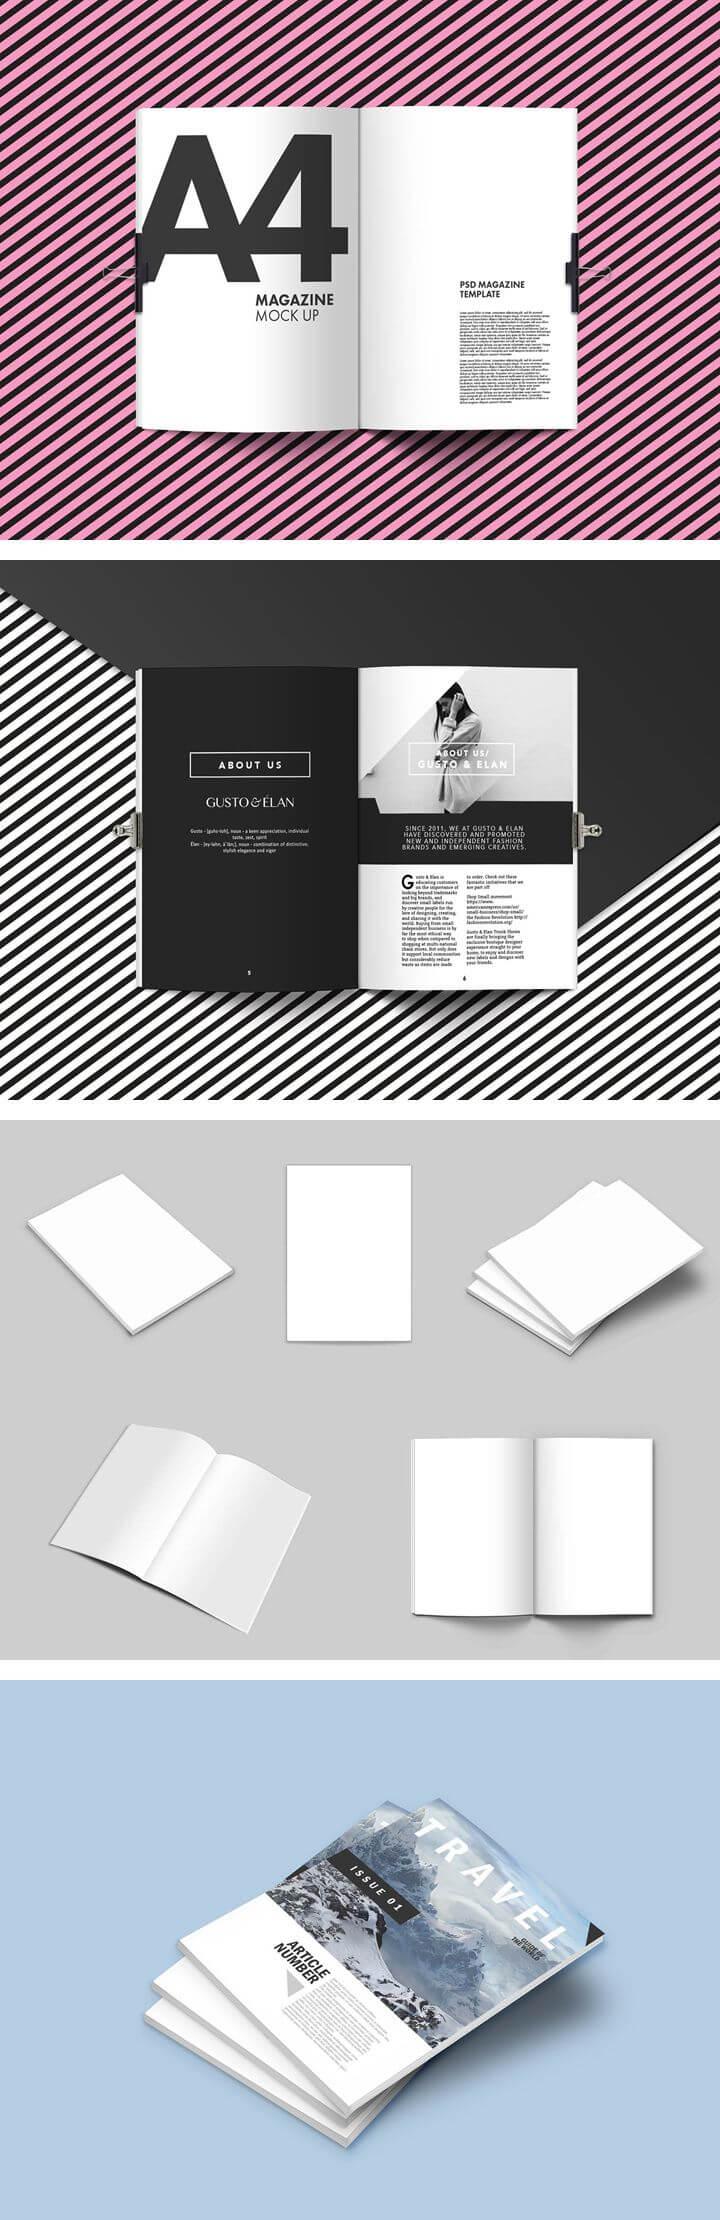 Magazine Mockups | Free: Design Elements regarding Blank Magazine Template Psd